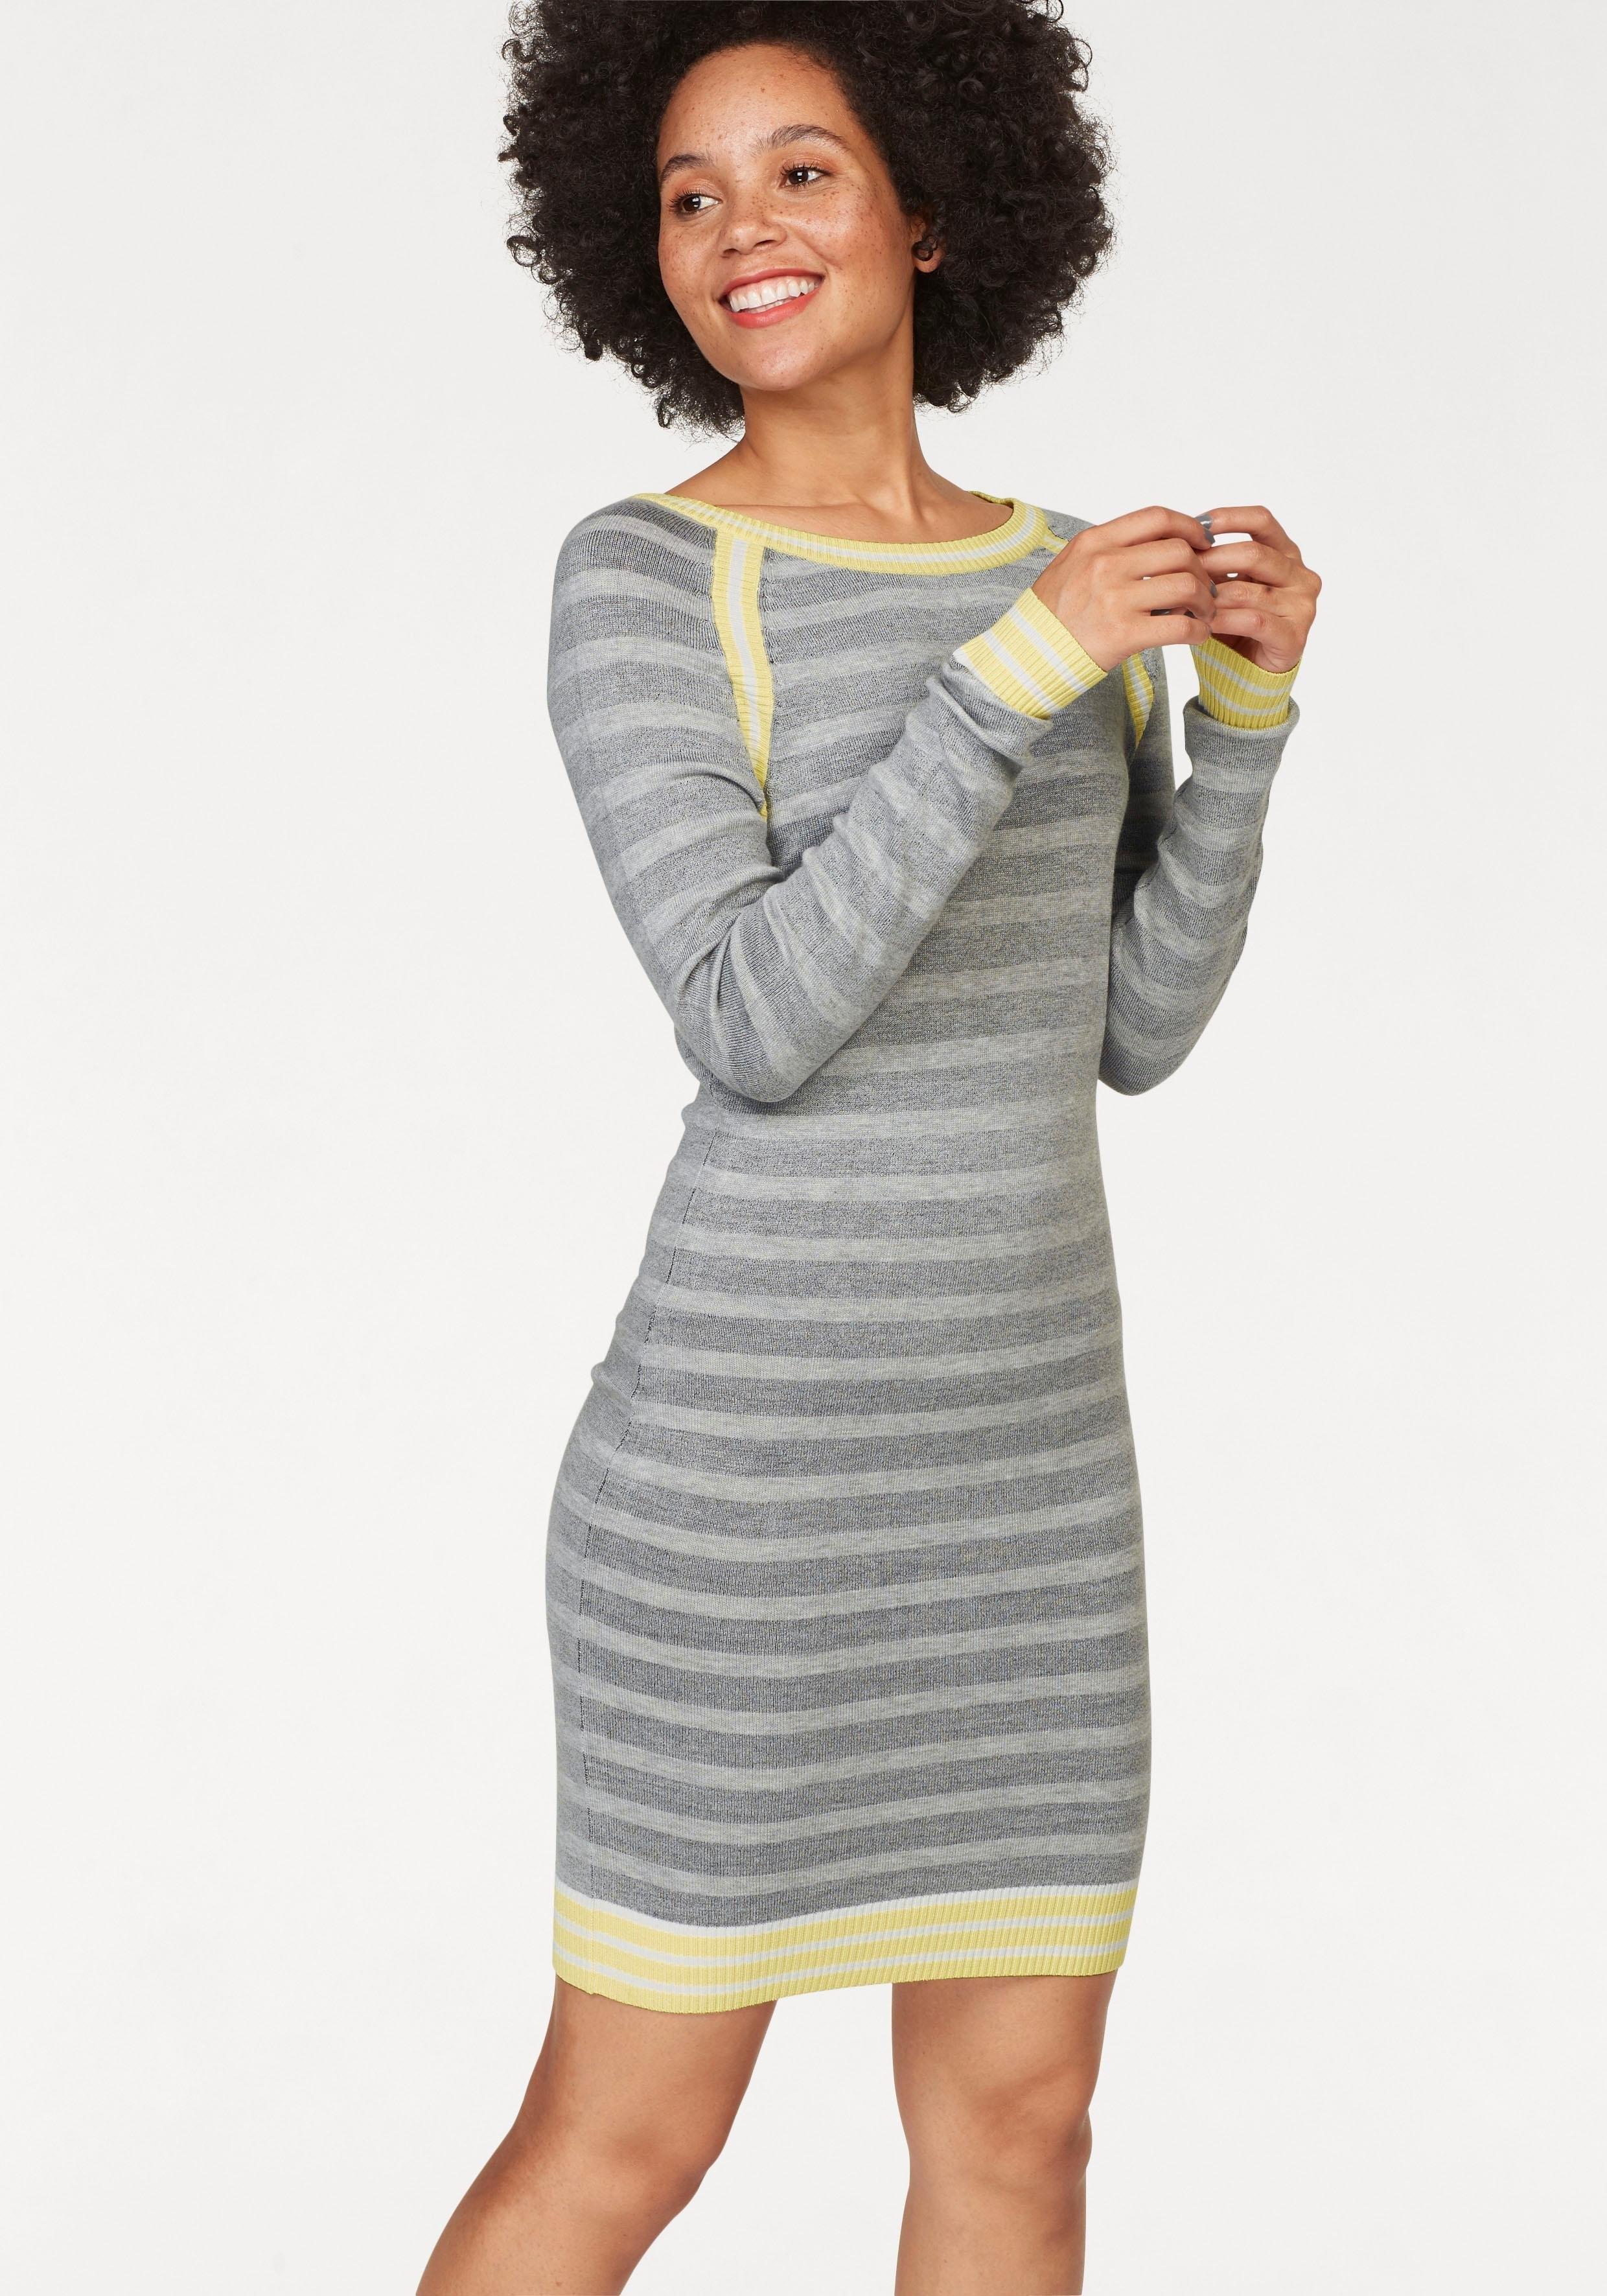 1ff42ef3278881 Gebreide jurk online kopen  Shop je jurk hier